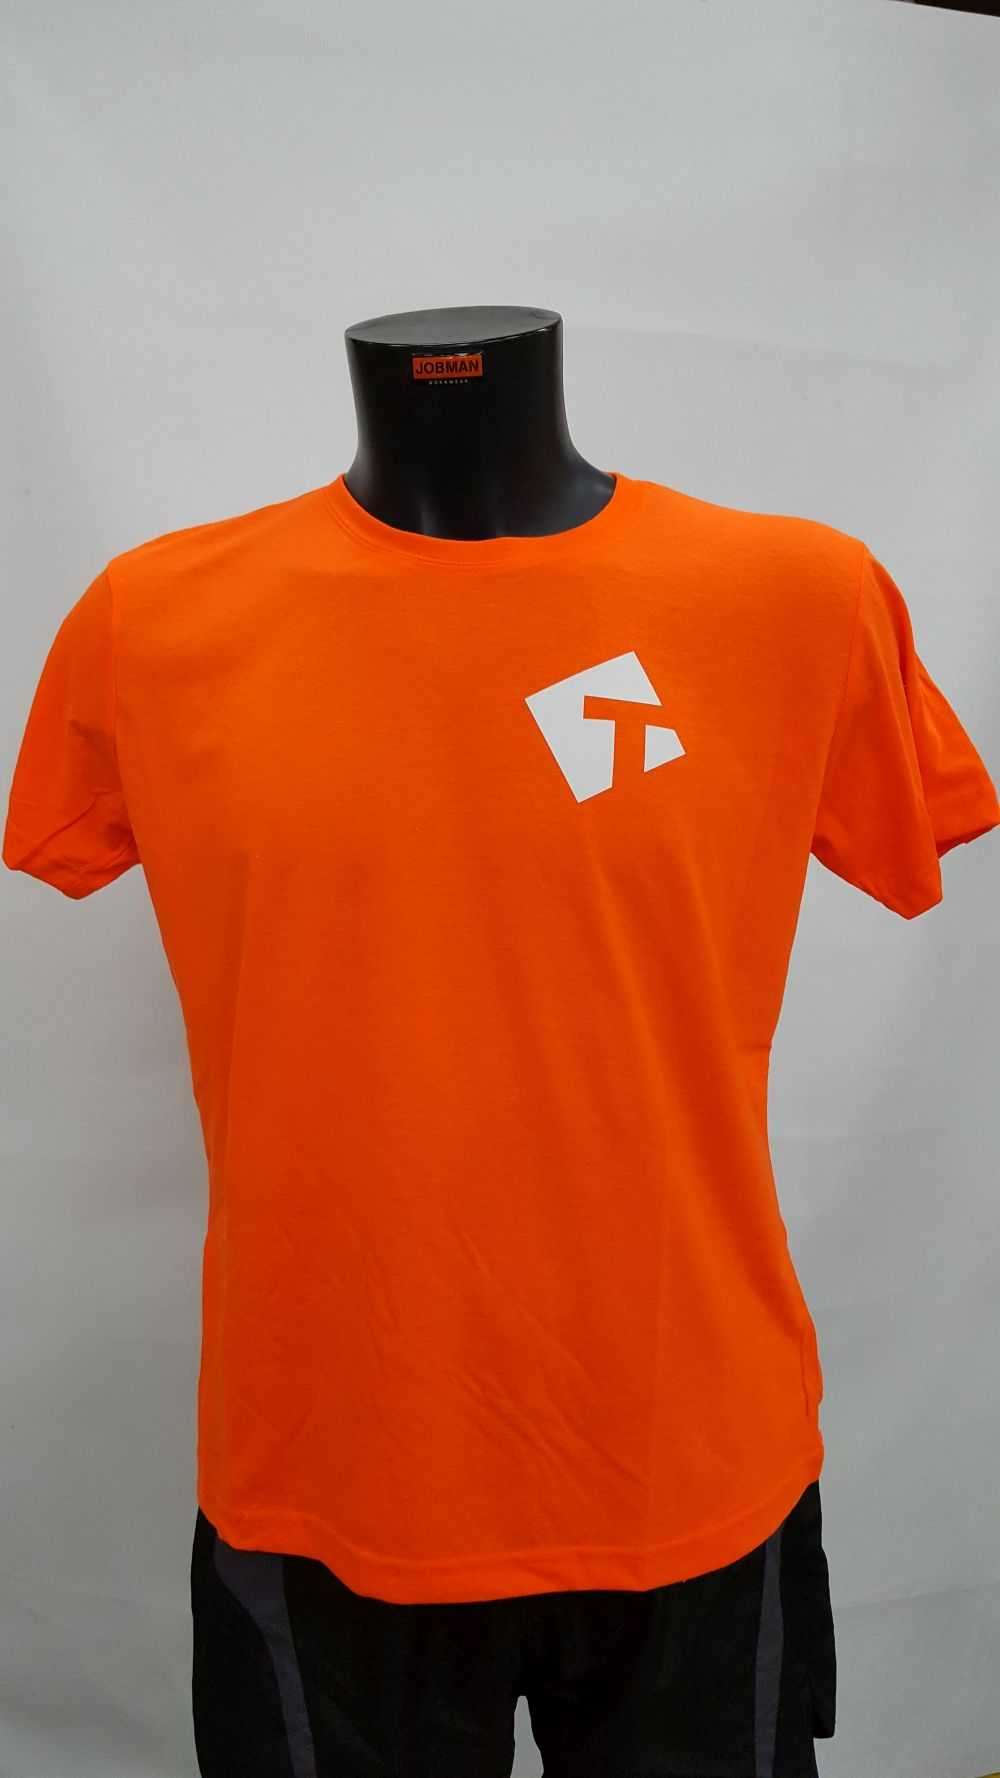 Theresia Lyceum bedrukte T-shirts